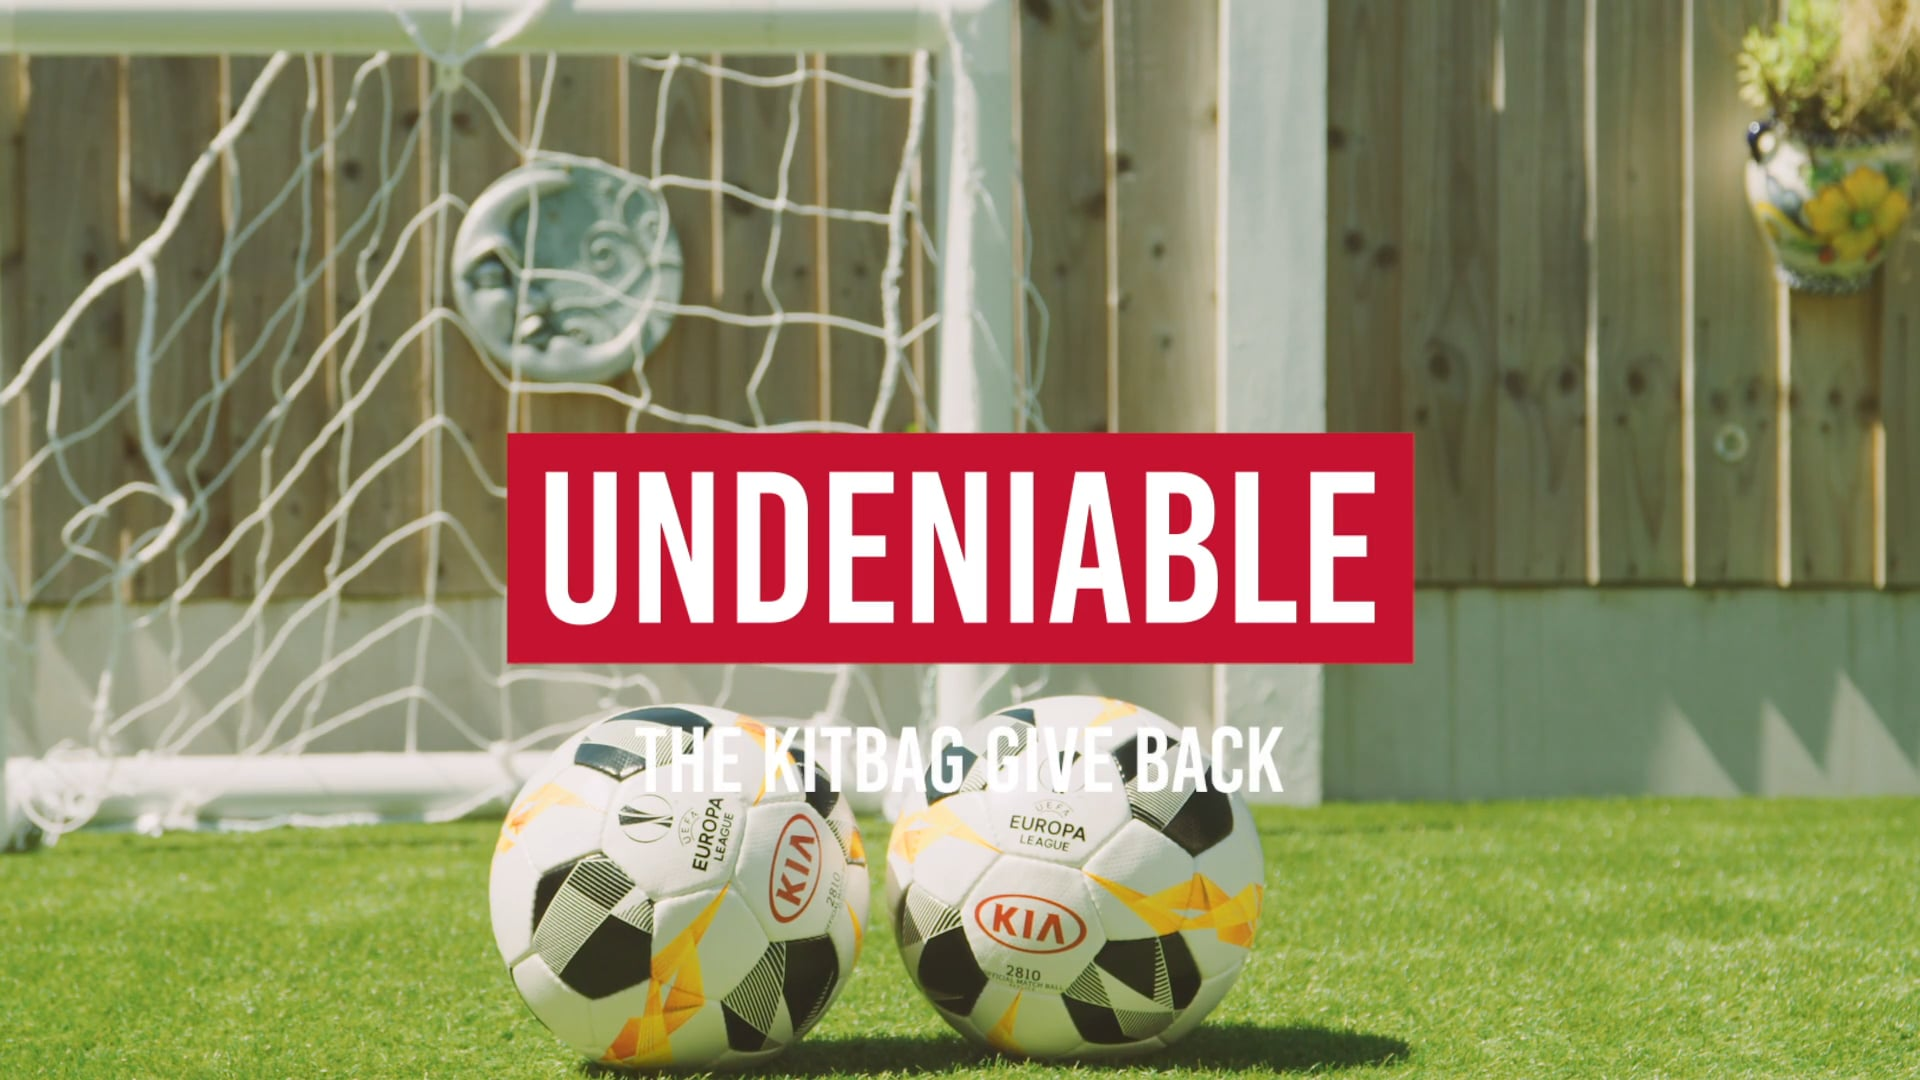 Kia x UEFA Europa League - The Kit Bag Give Back -